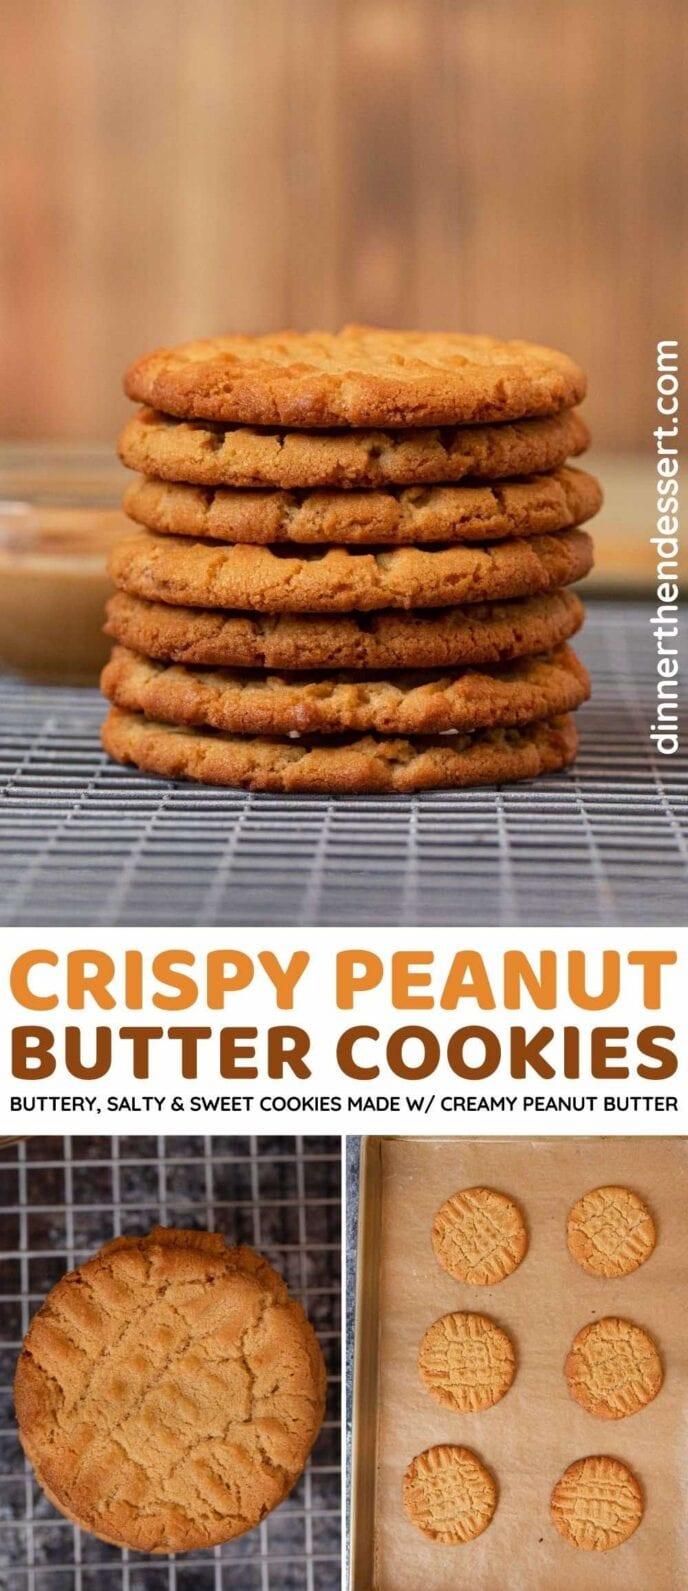 Crispy peanut butter cookies collage